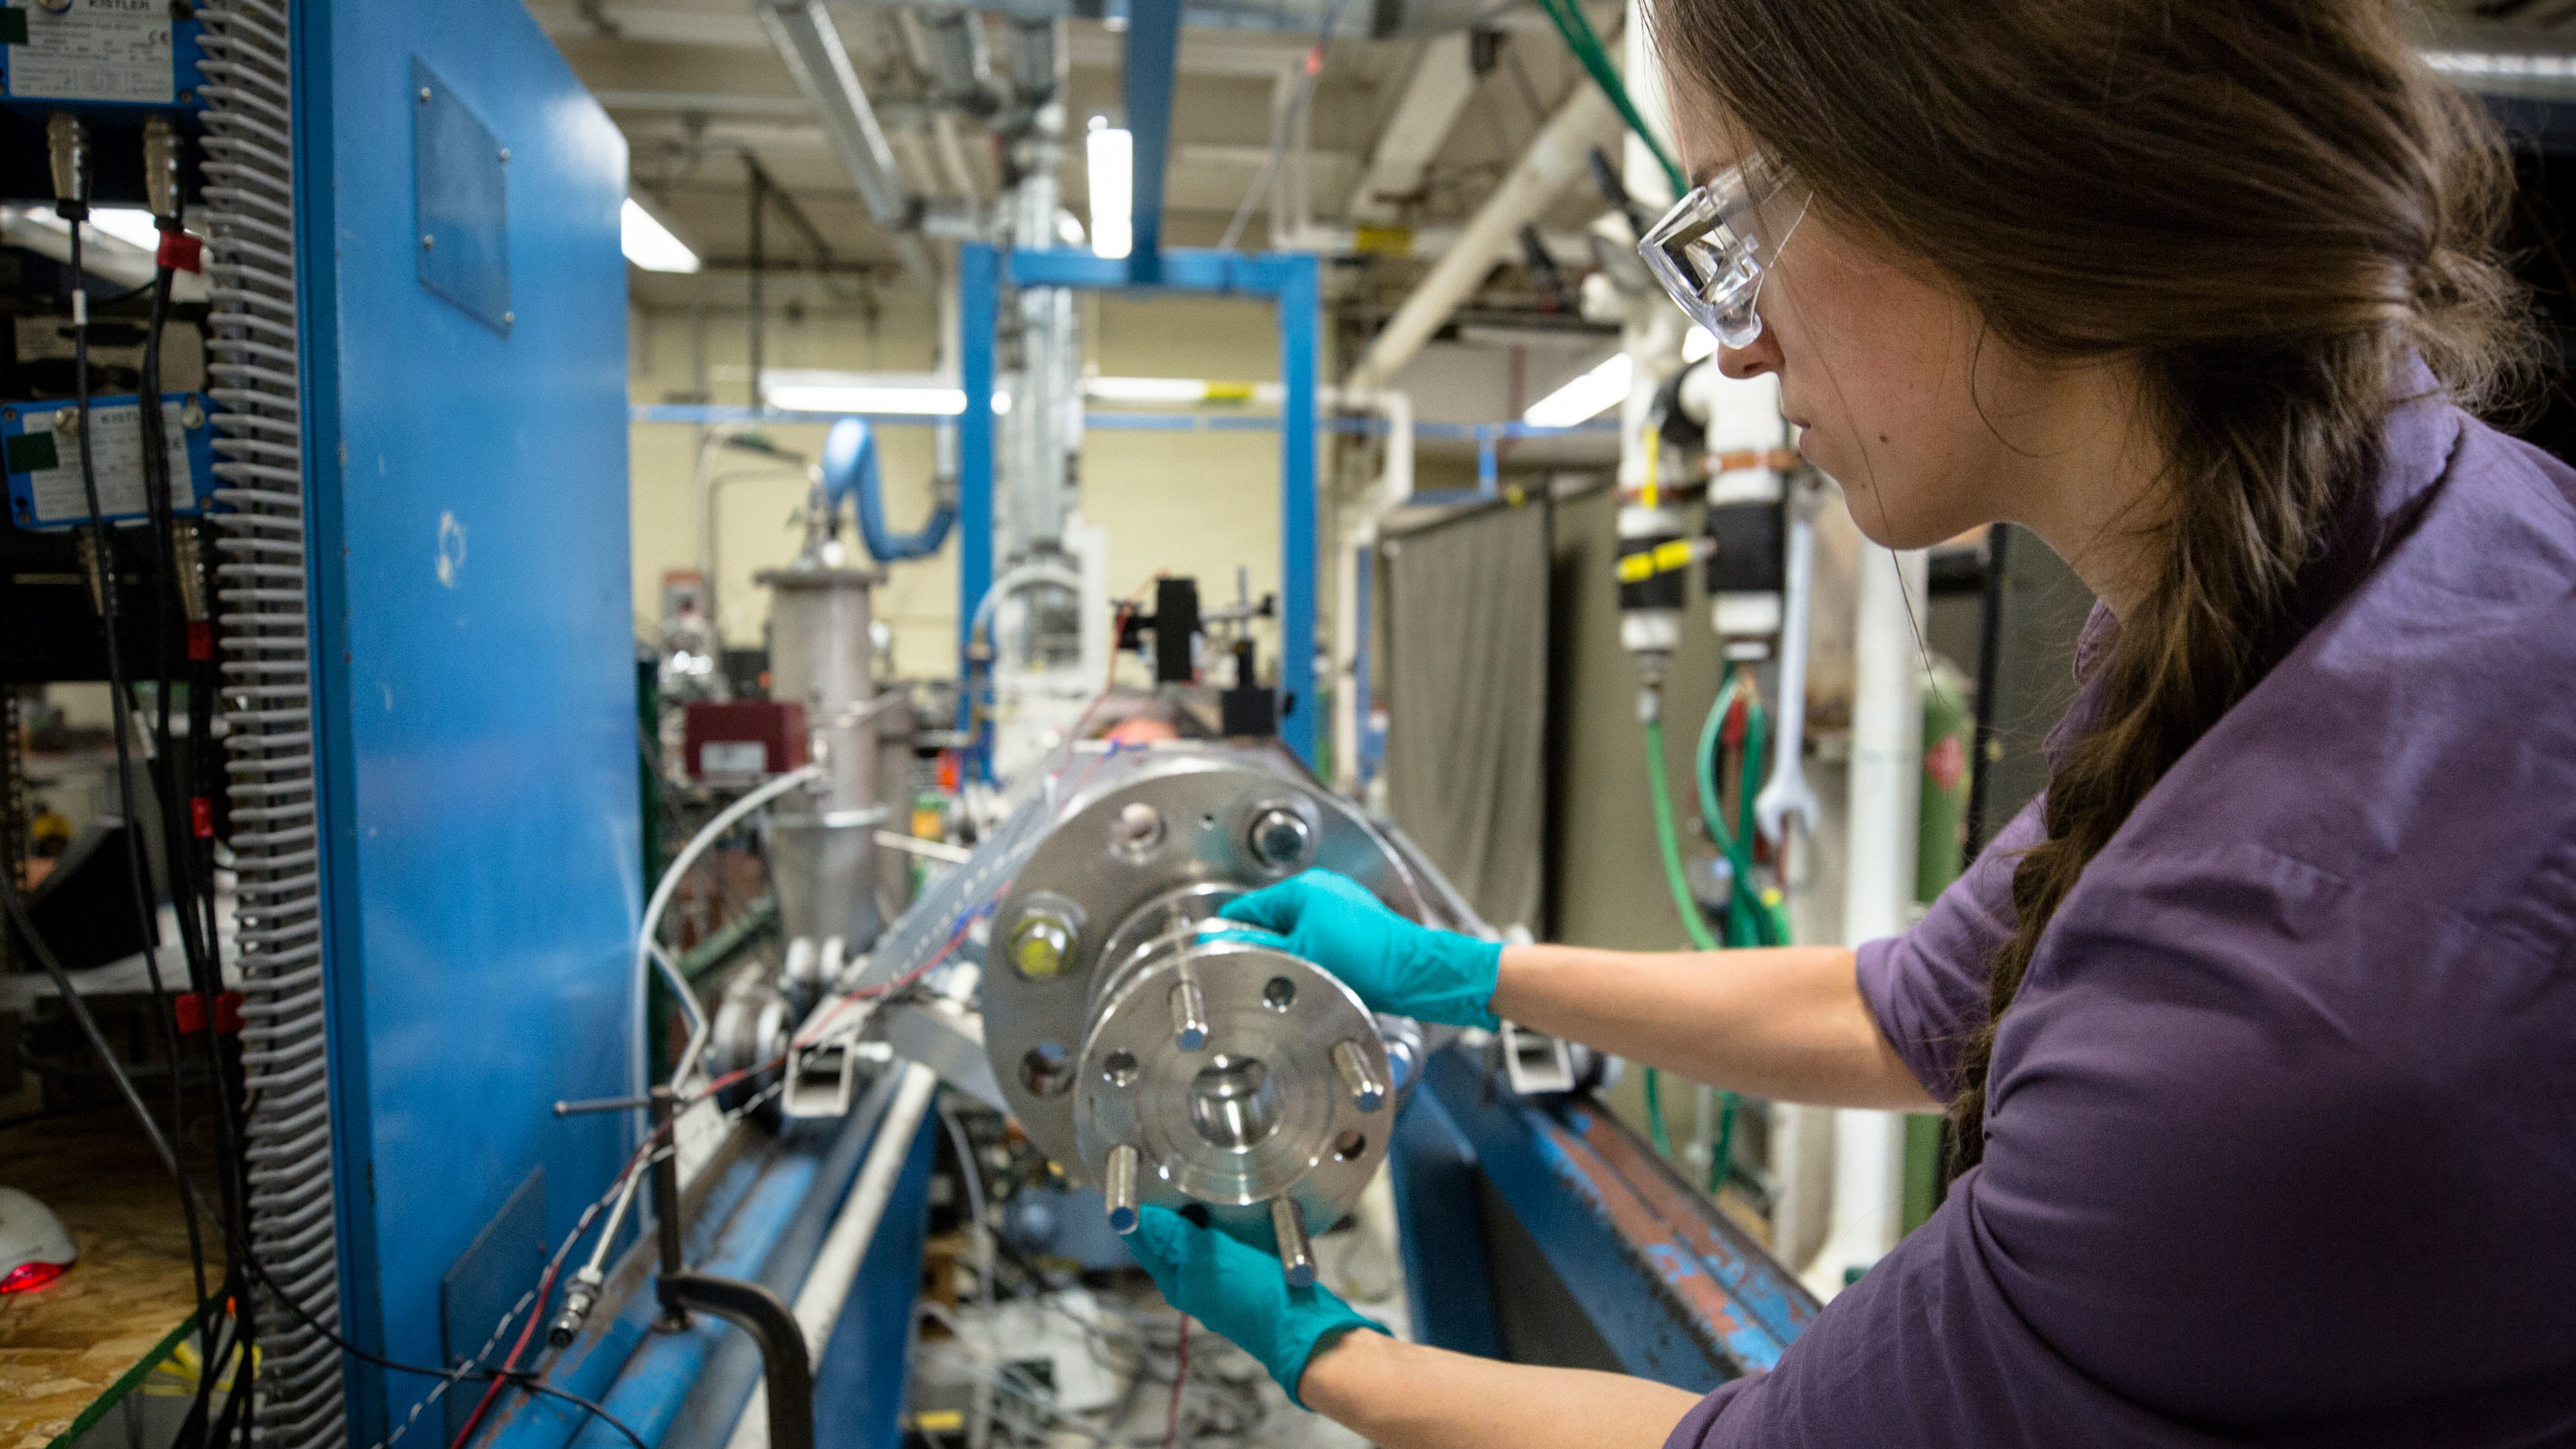 PhD student Rachel Schwind works in the lab